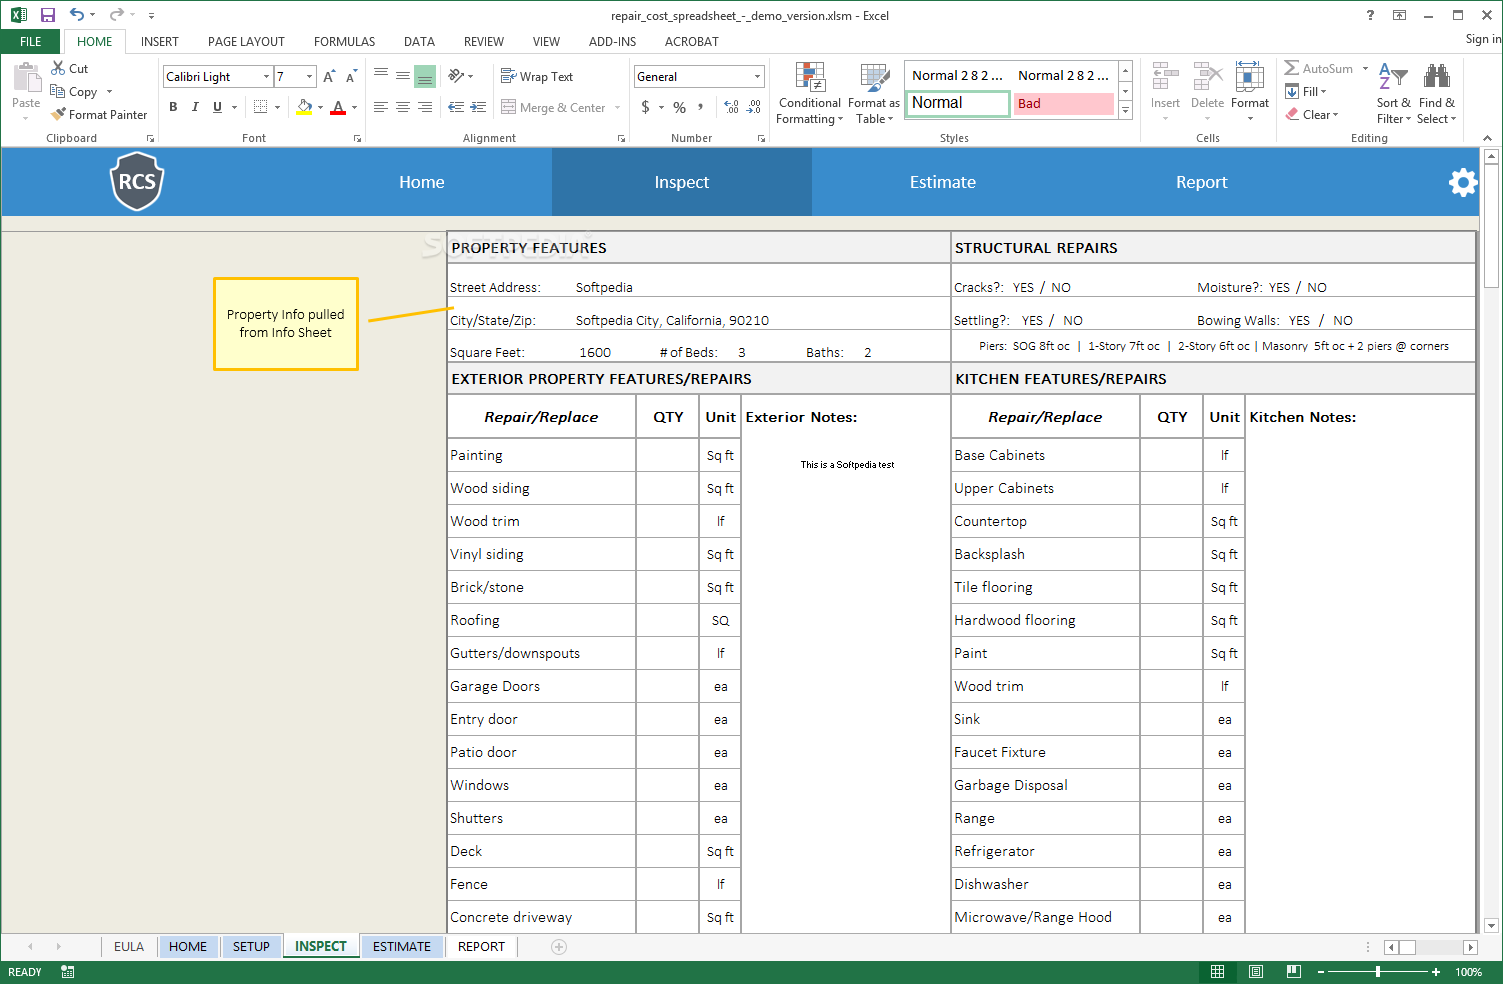 Download Remodel Cost Spreadsheet